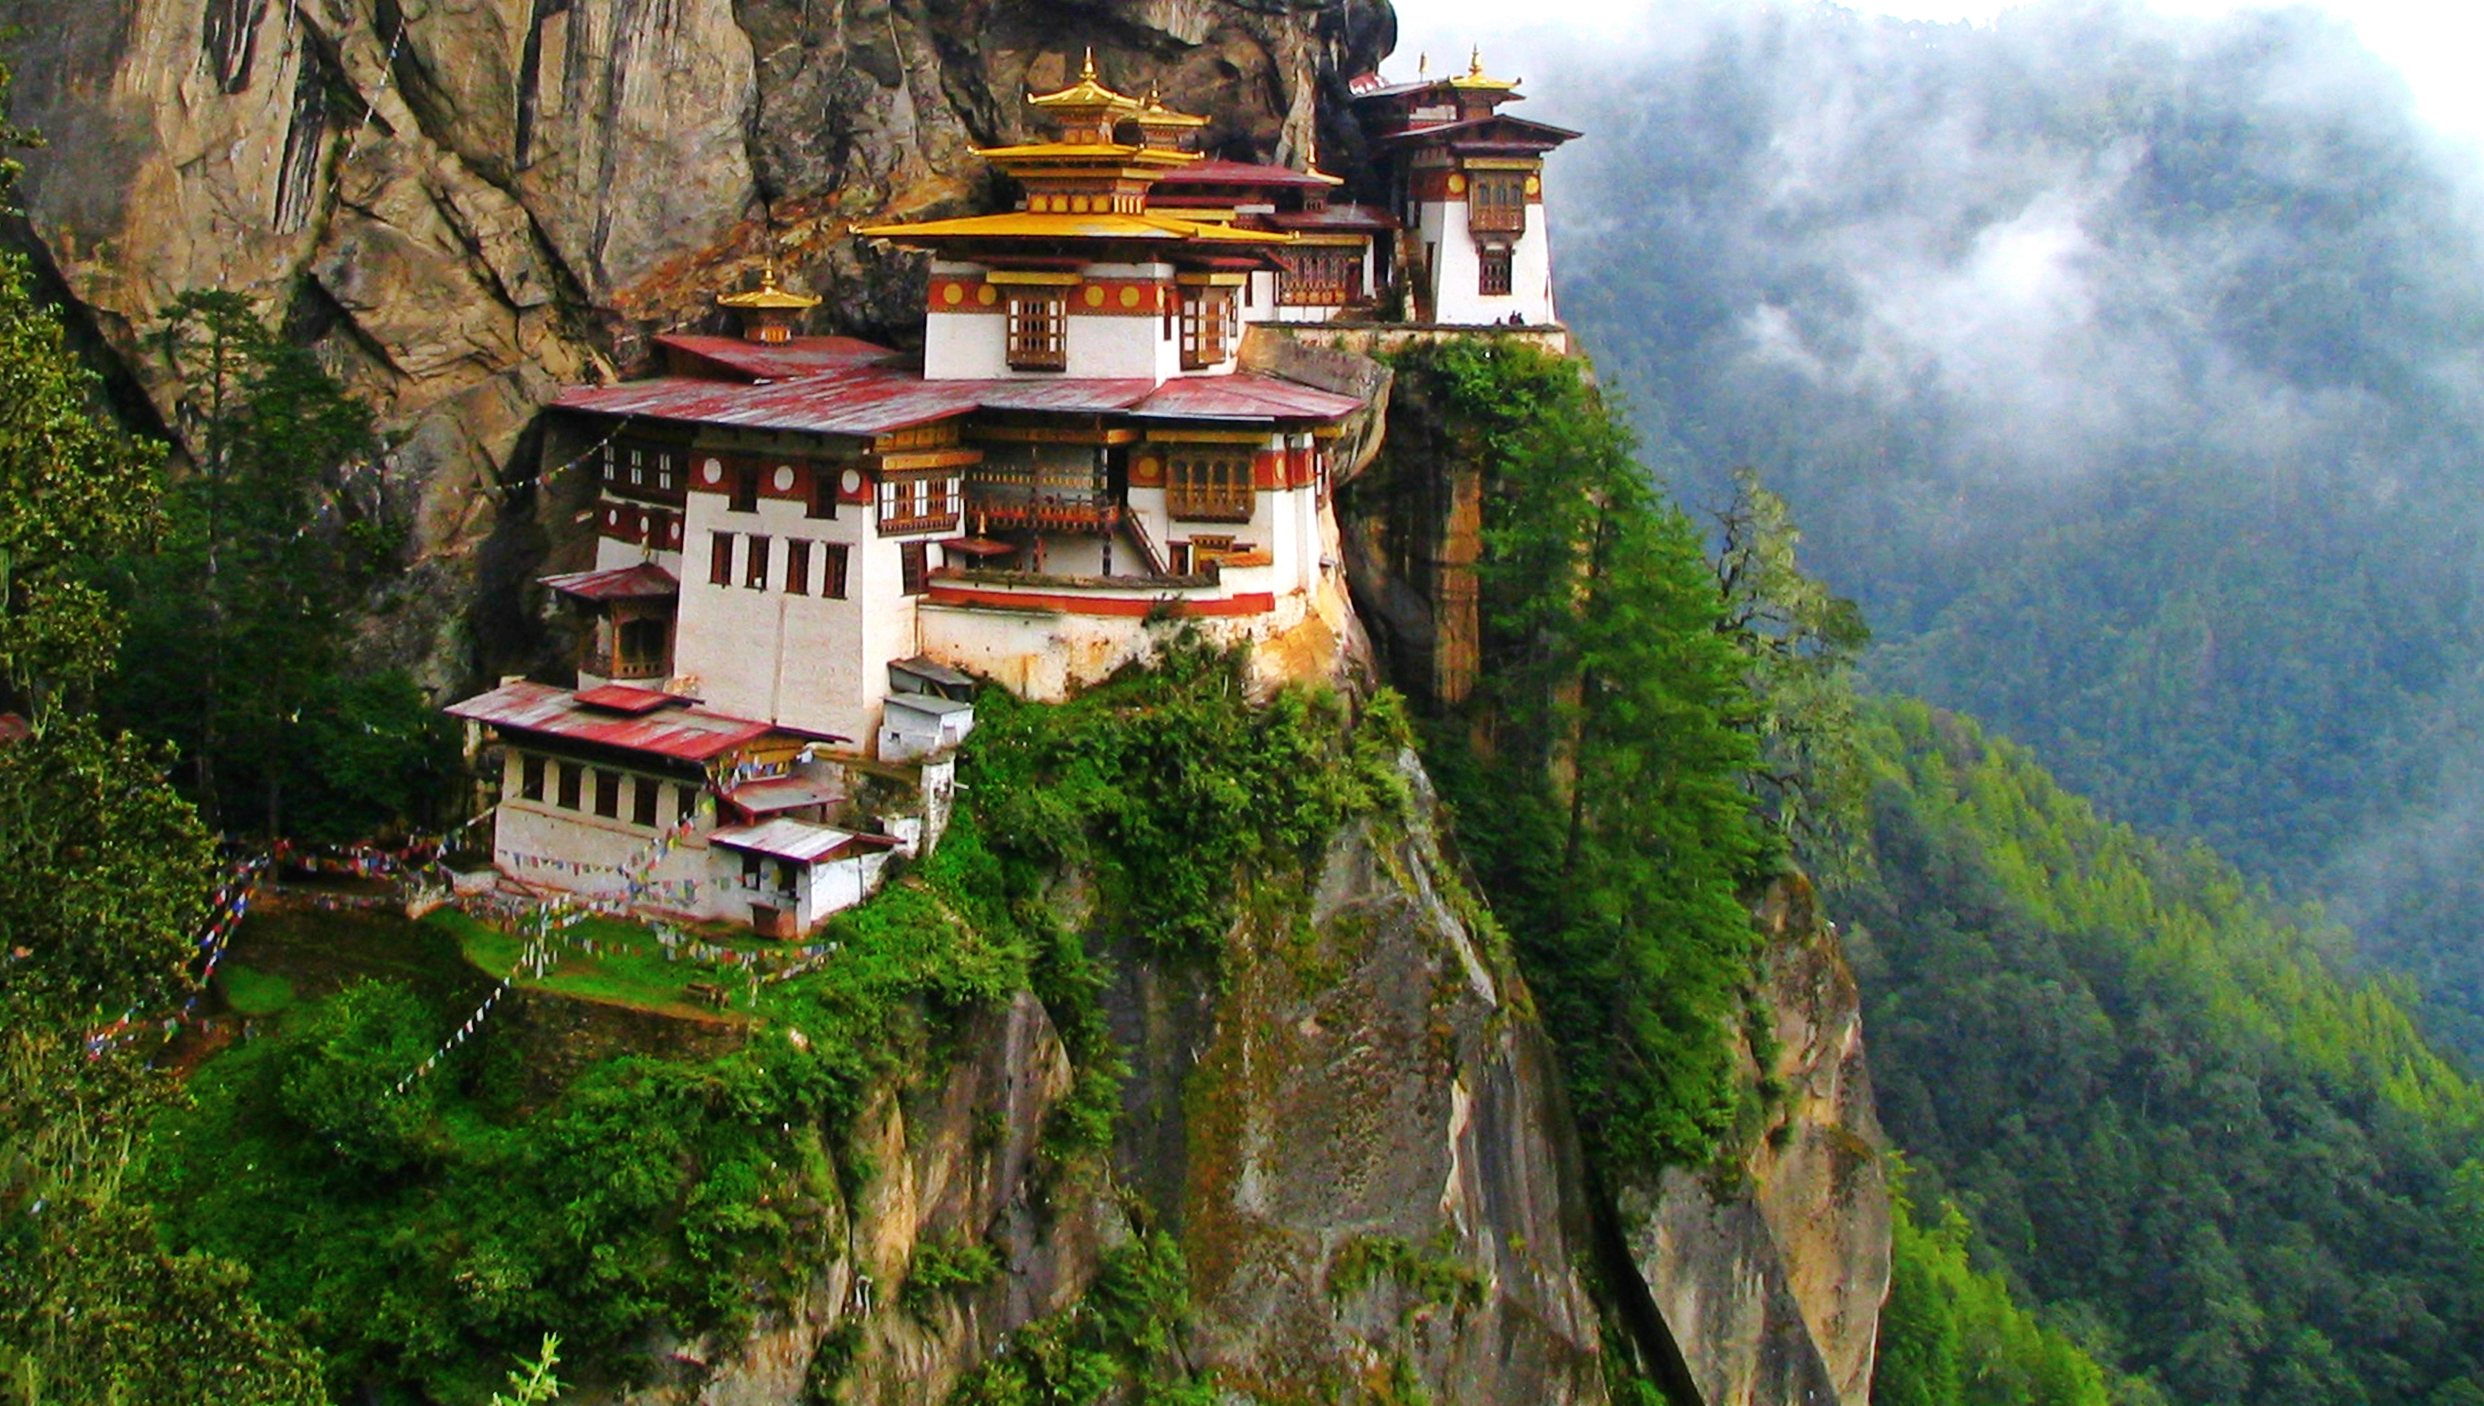 Tiger's Nest Monastery, Paro Valley, Bhutan  ALK3R